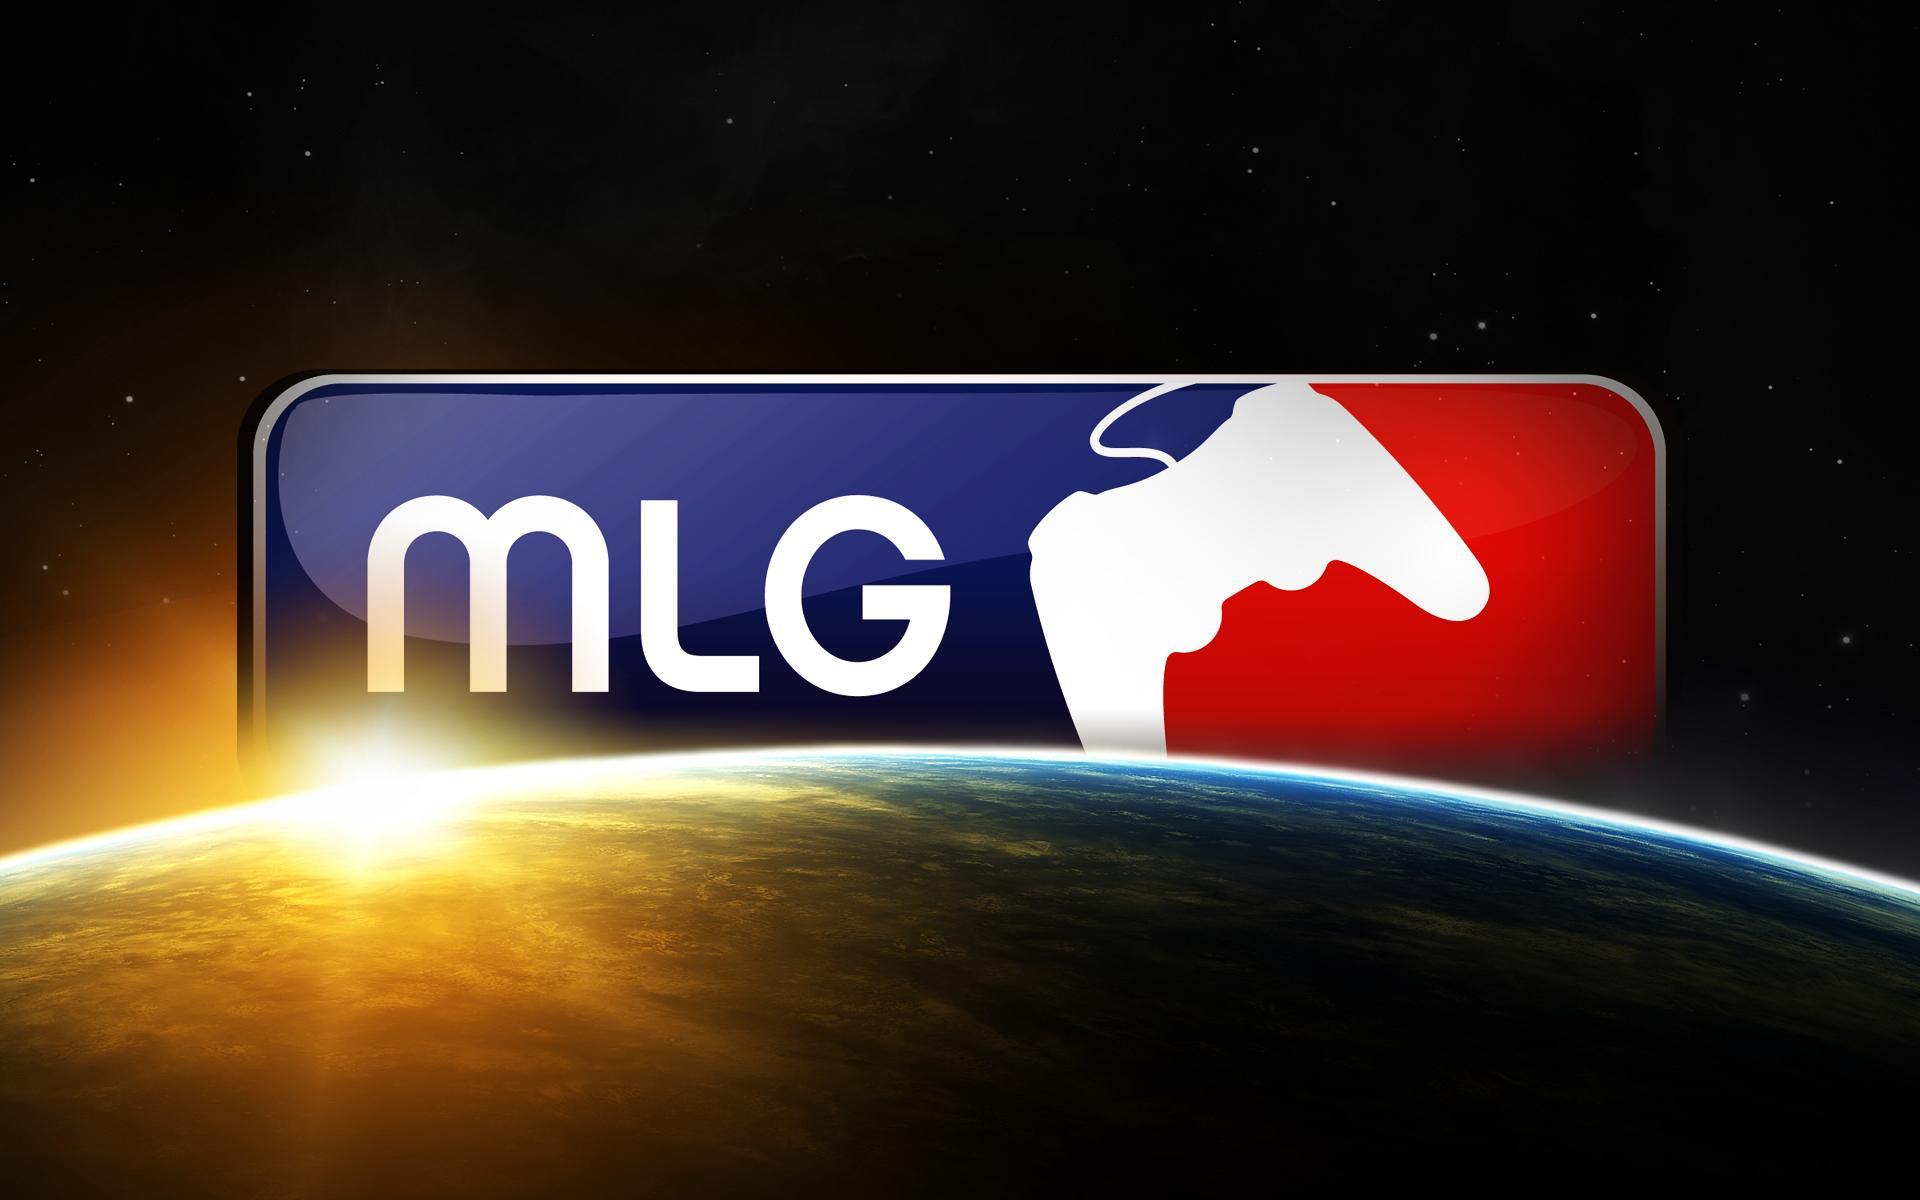 Gaming desktop backgrounds wallpaper cave - Gaming logo wallpaper ...